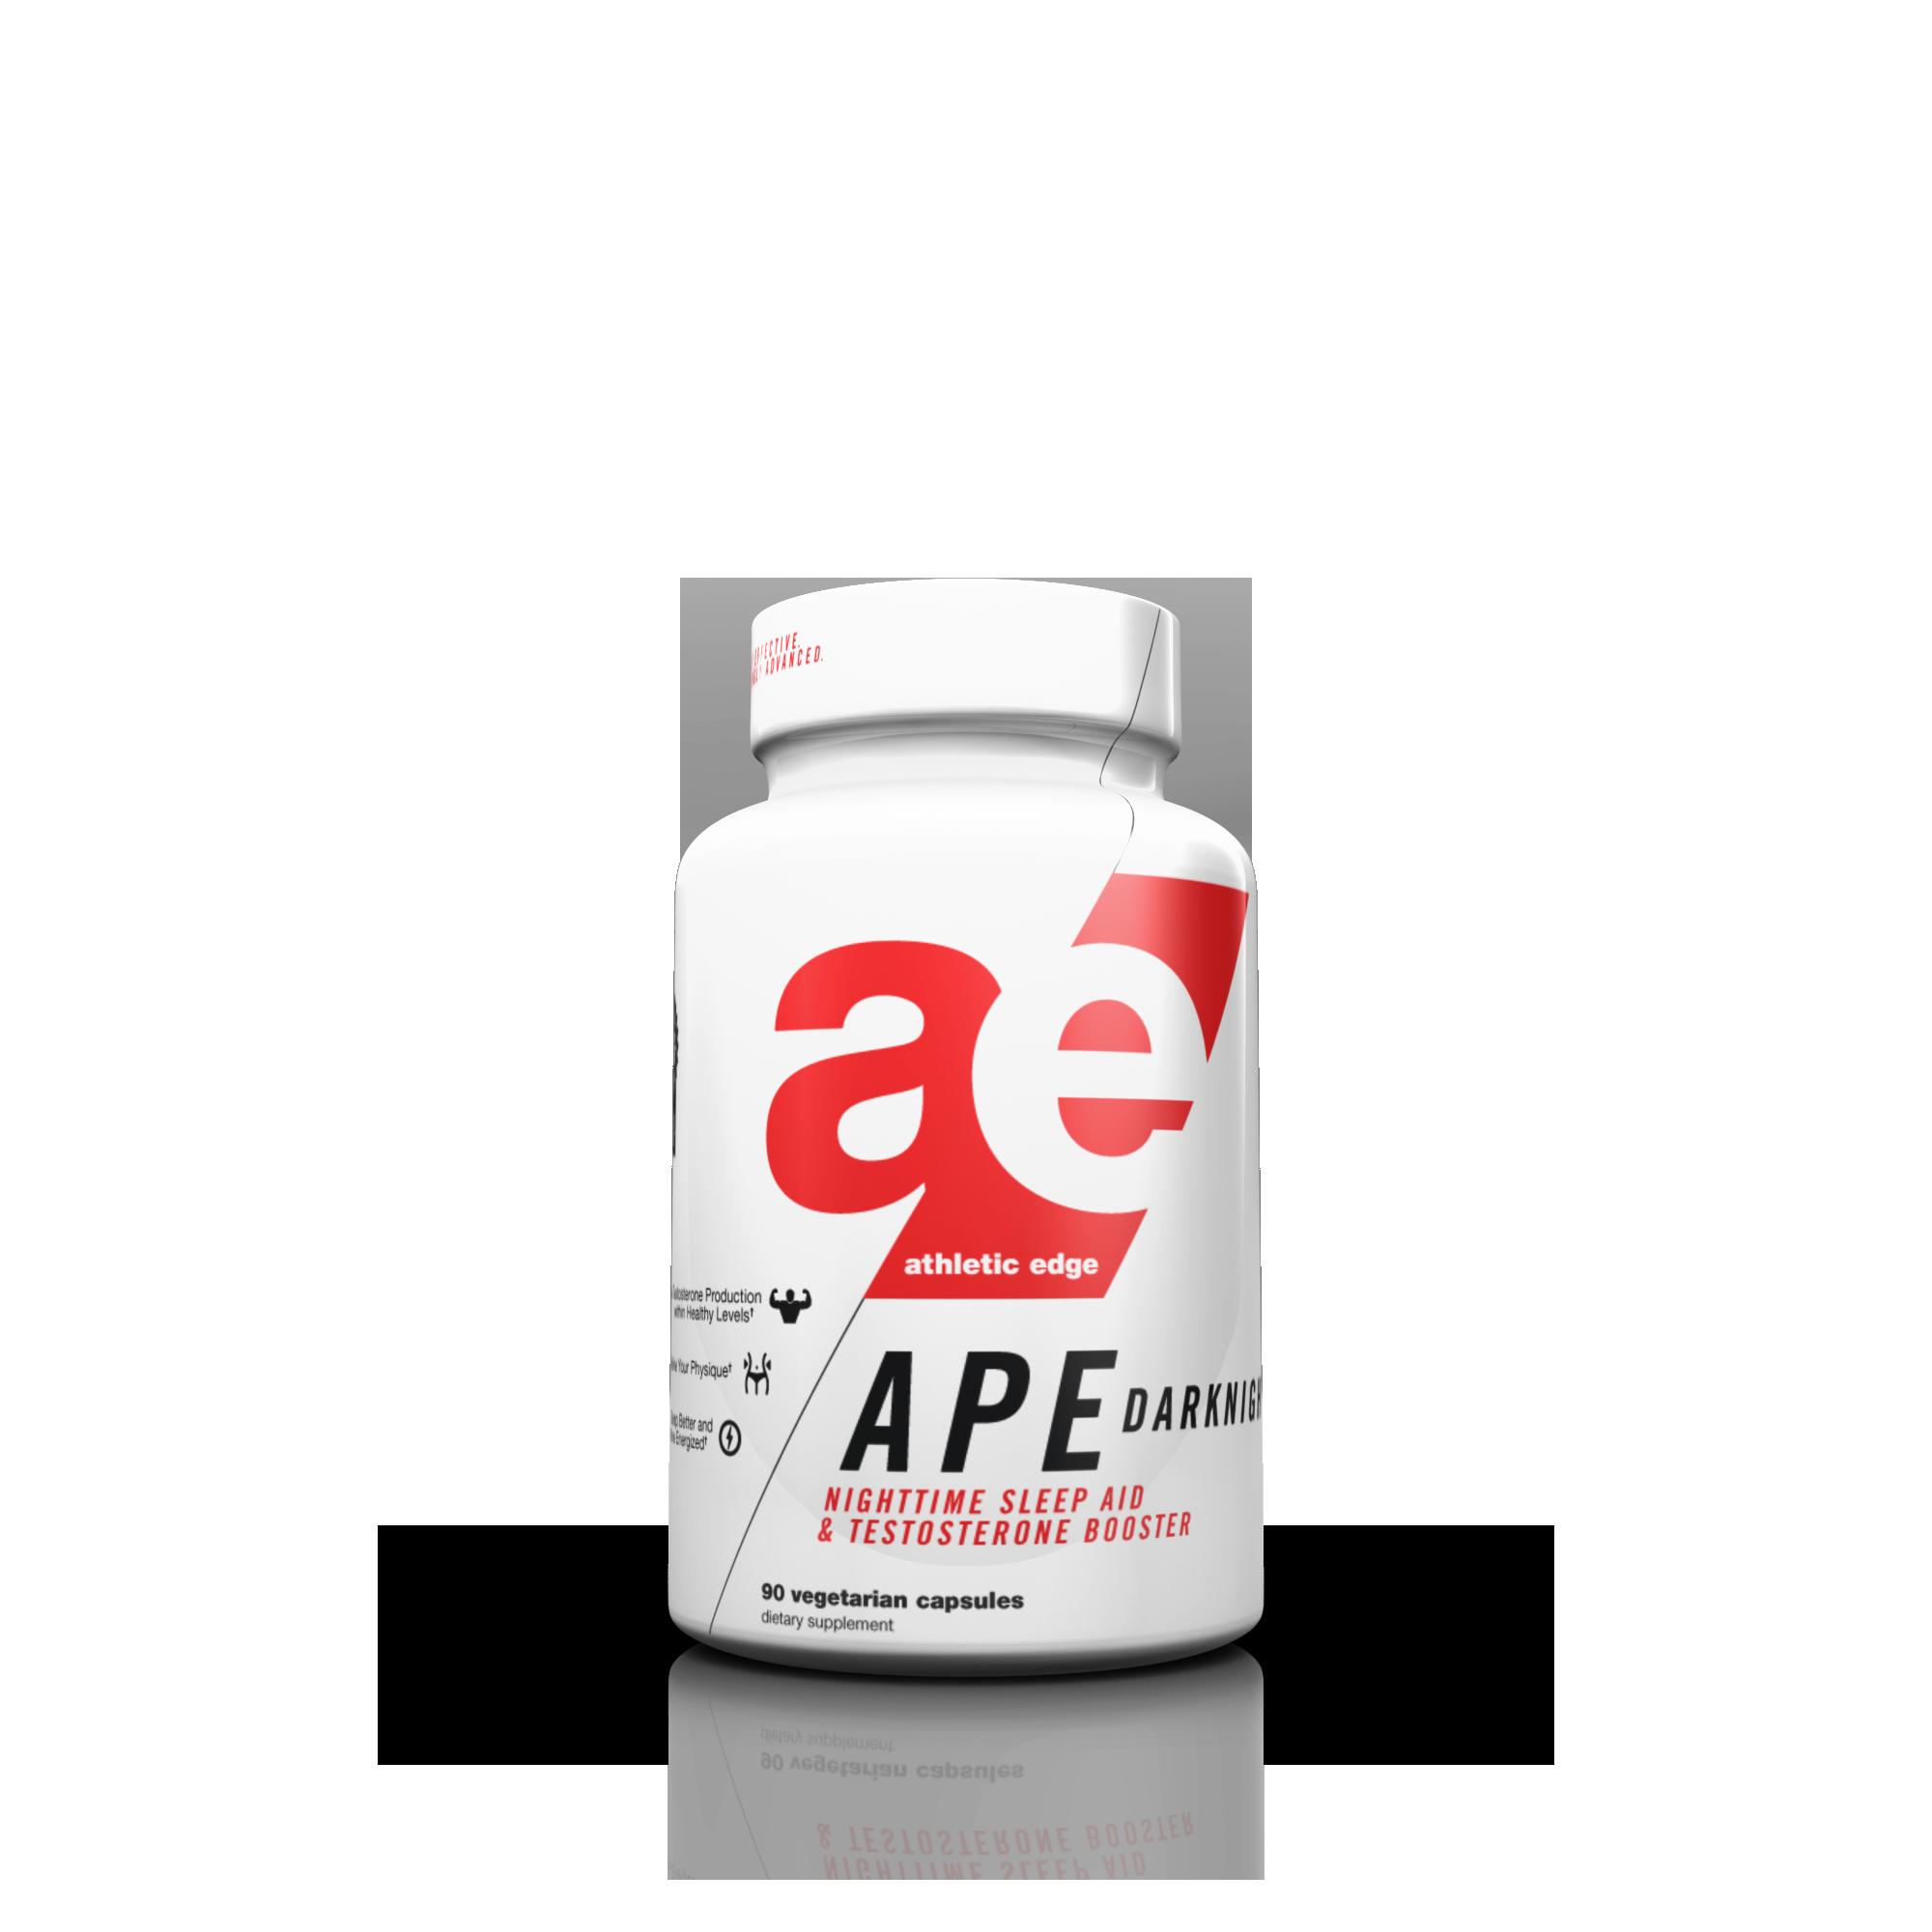 APE DARKNIGHT - Night-time Testosterone Booster